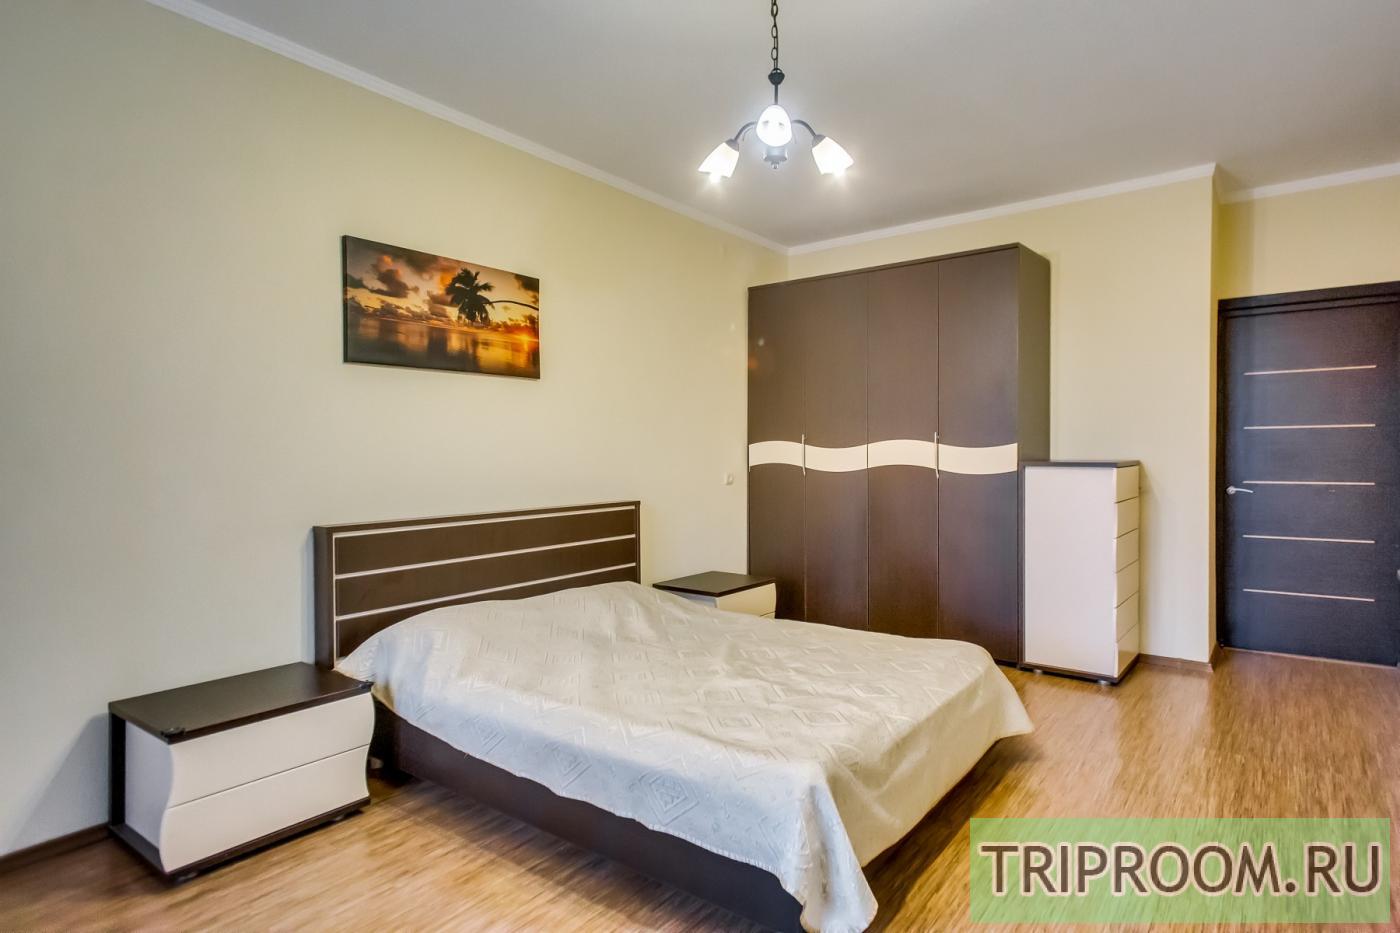 2-комнатная квартира посуточно (вариант № 23730), ул. Максима Горького улица, фото № 18